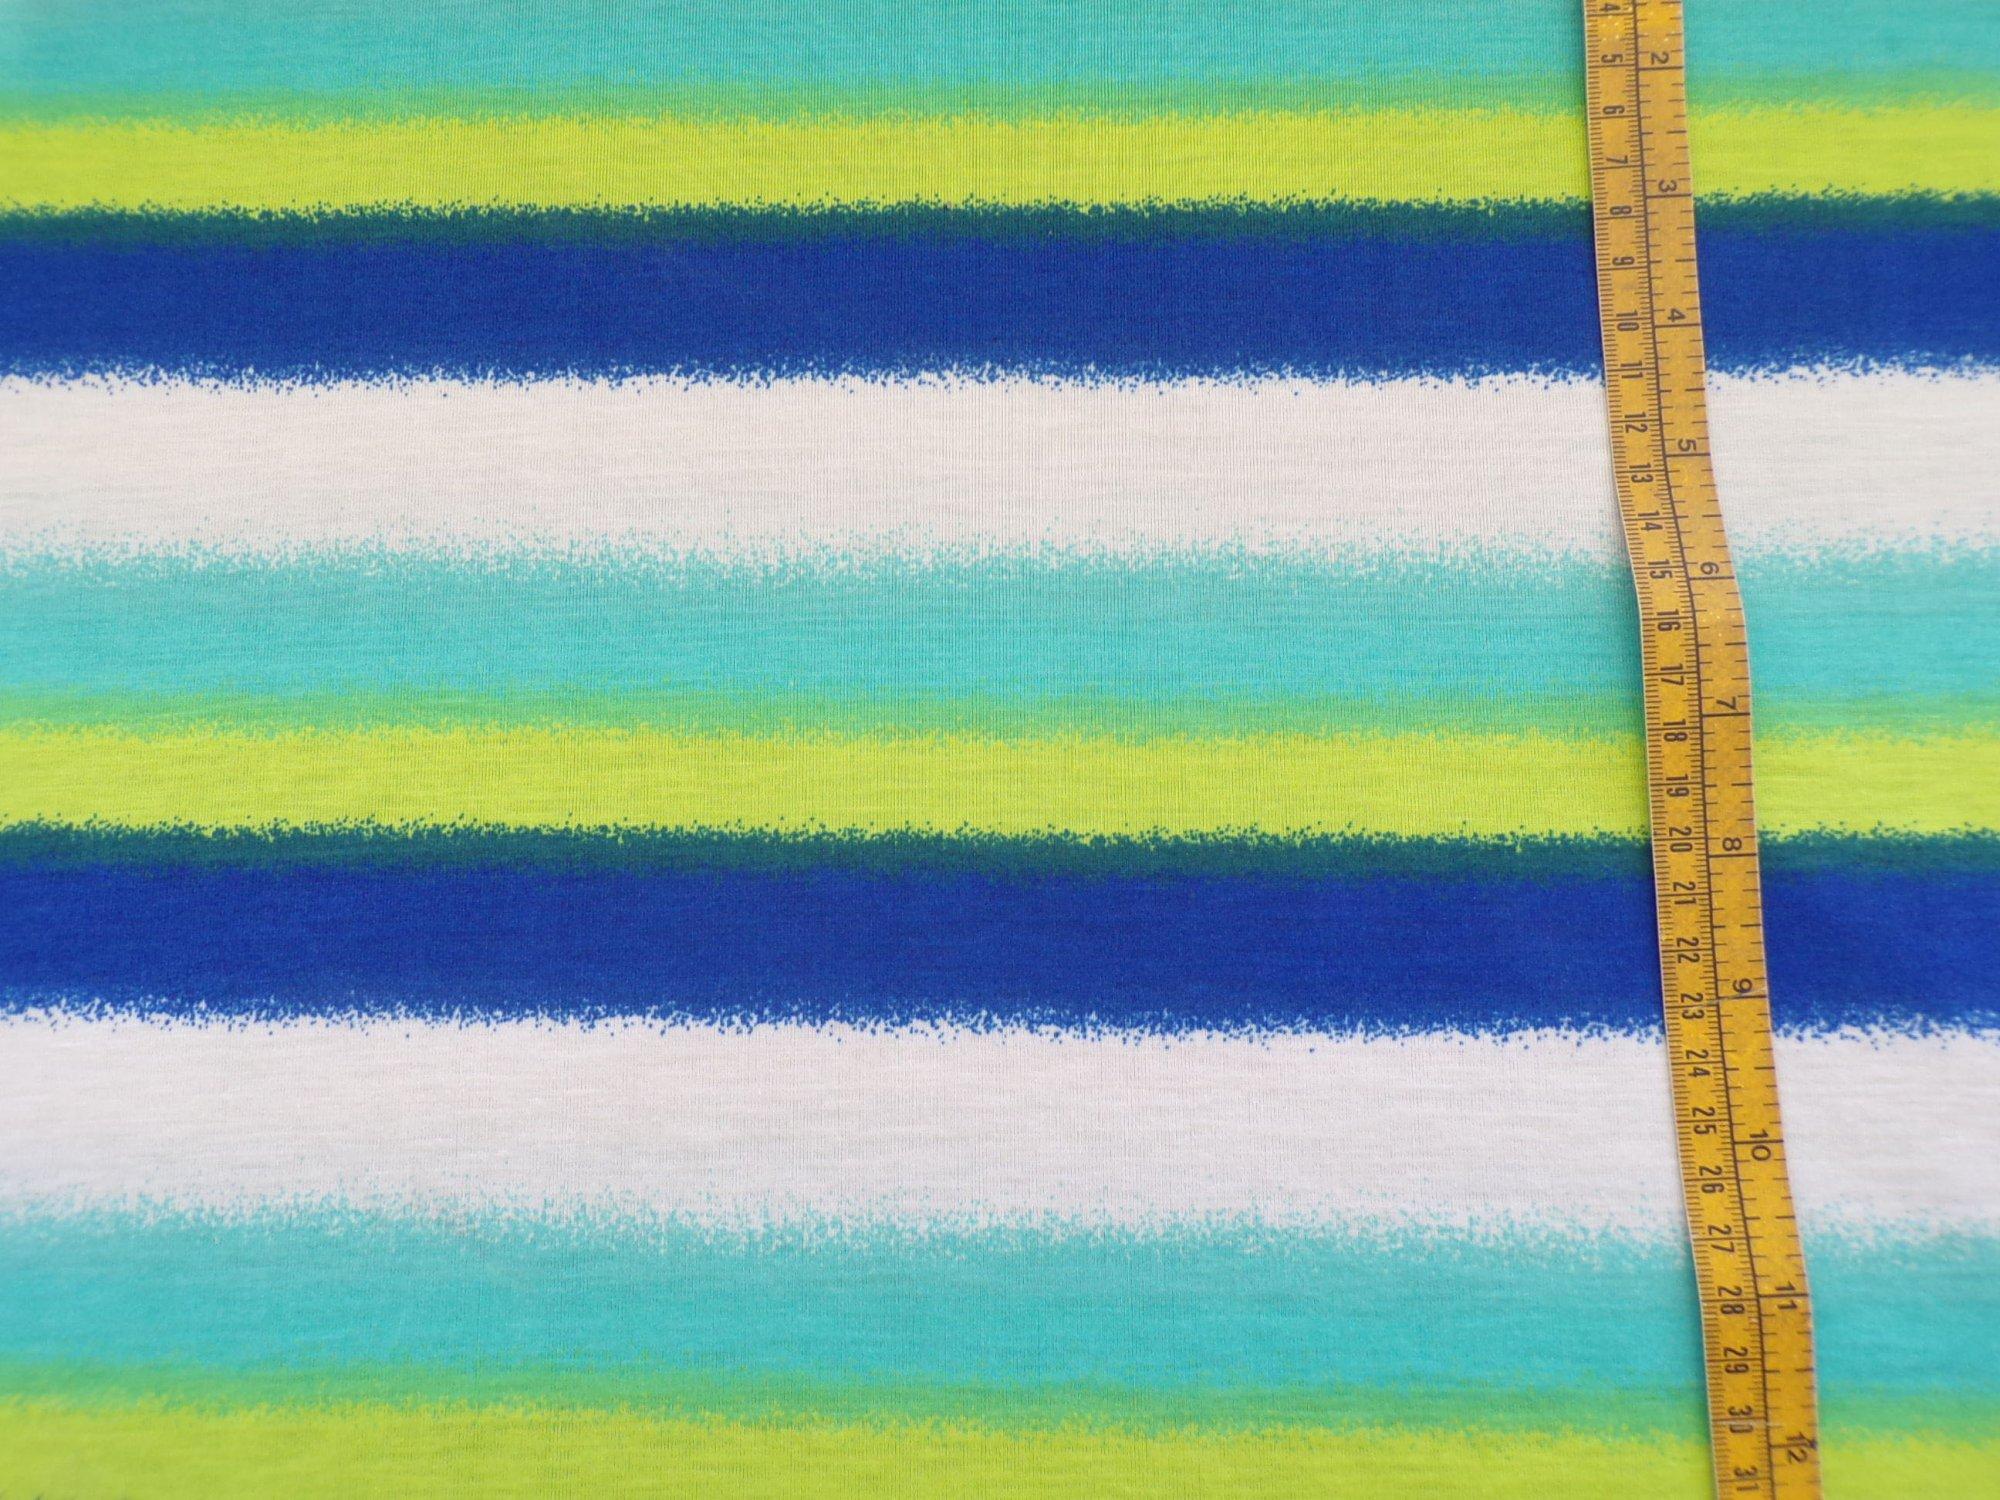 Polyester Slub Jersey - Ivory Aqua Kiwi and Royal Stripes